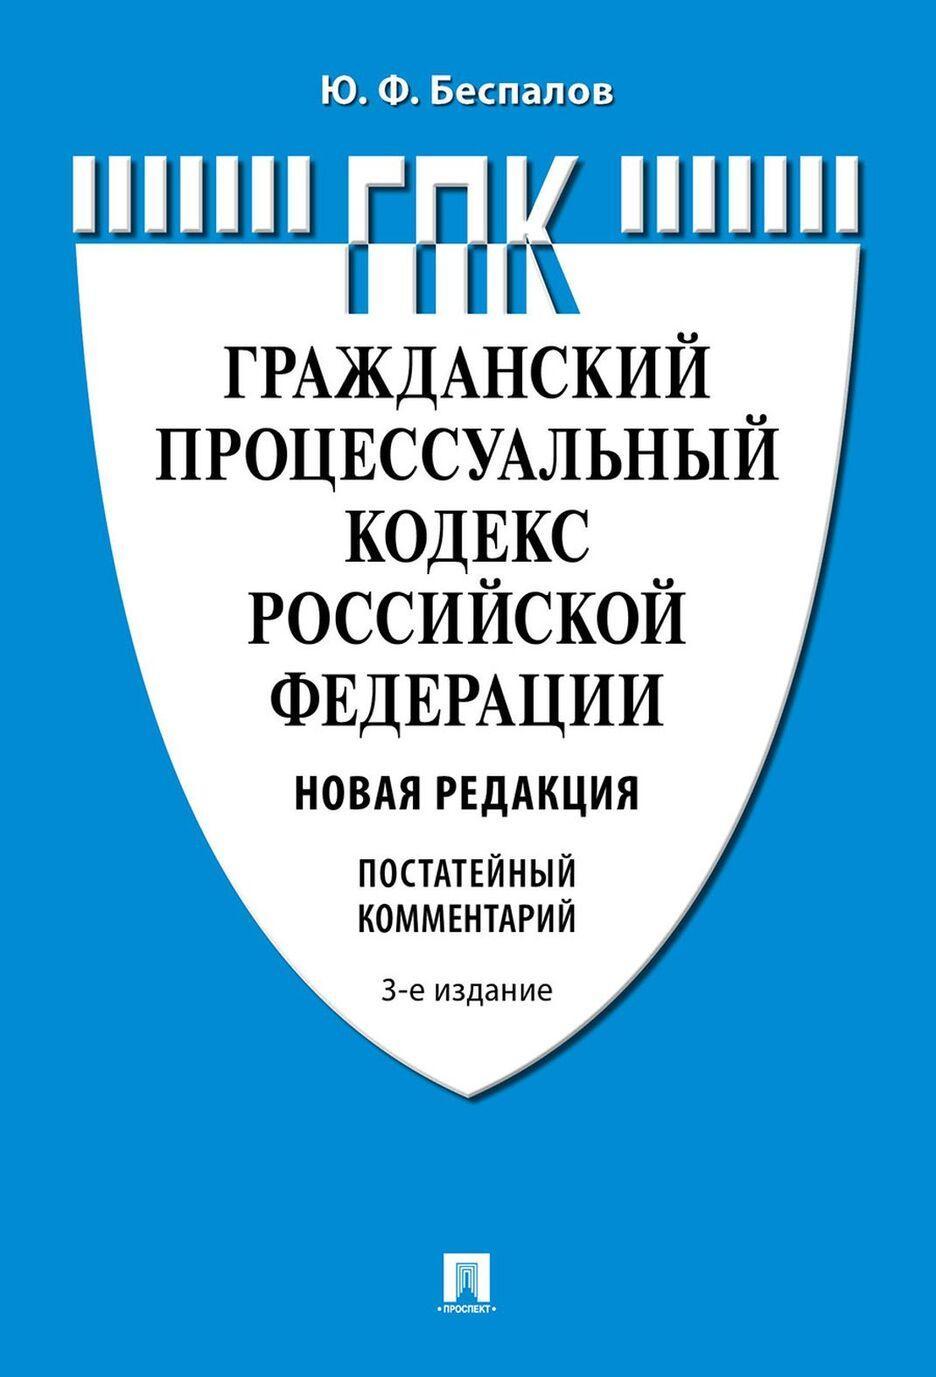 Kommentarij k GPK RF (postatejnyj).-3-e izd., pererab. i dop.-M.:Prospekt,2020.